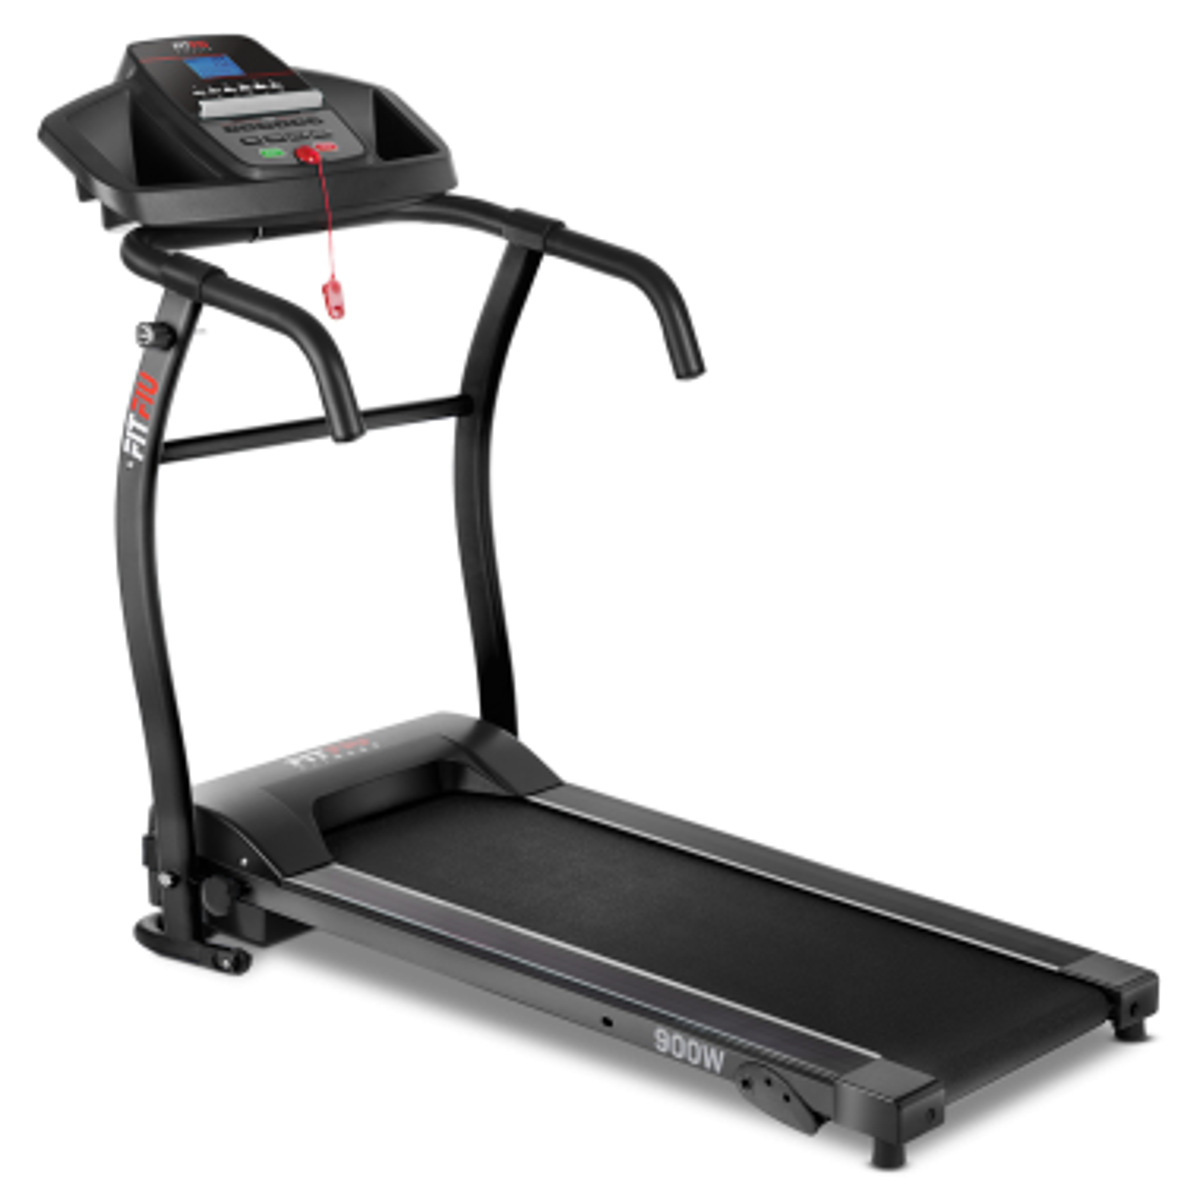 Cinta de correr plegable MC-90 como producto recomendado